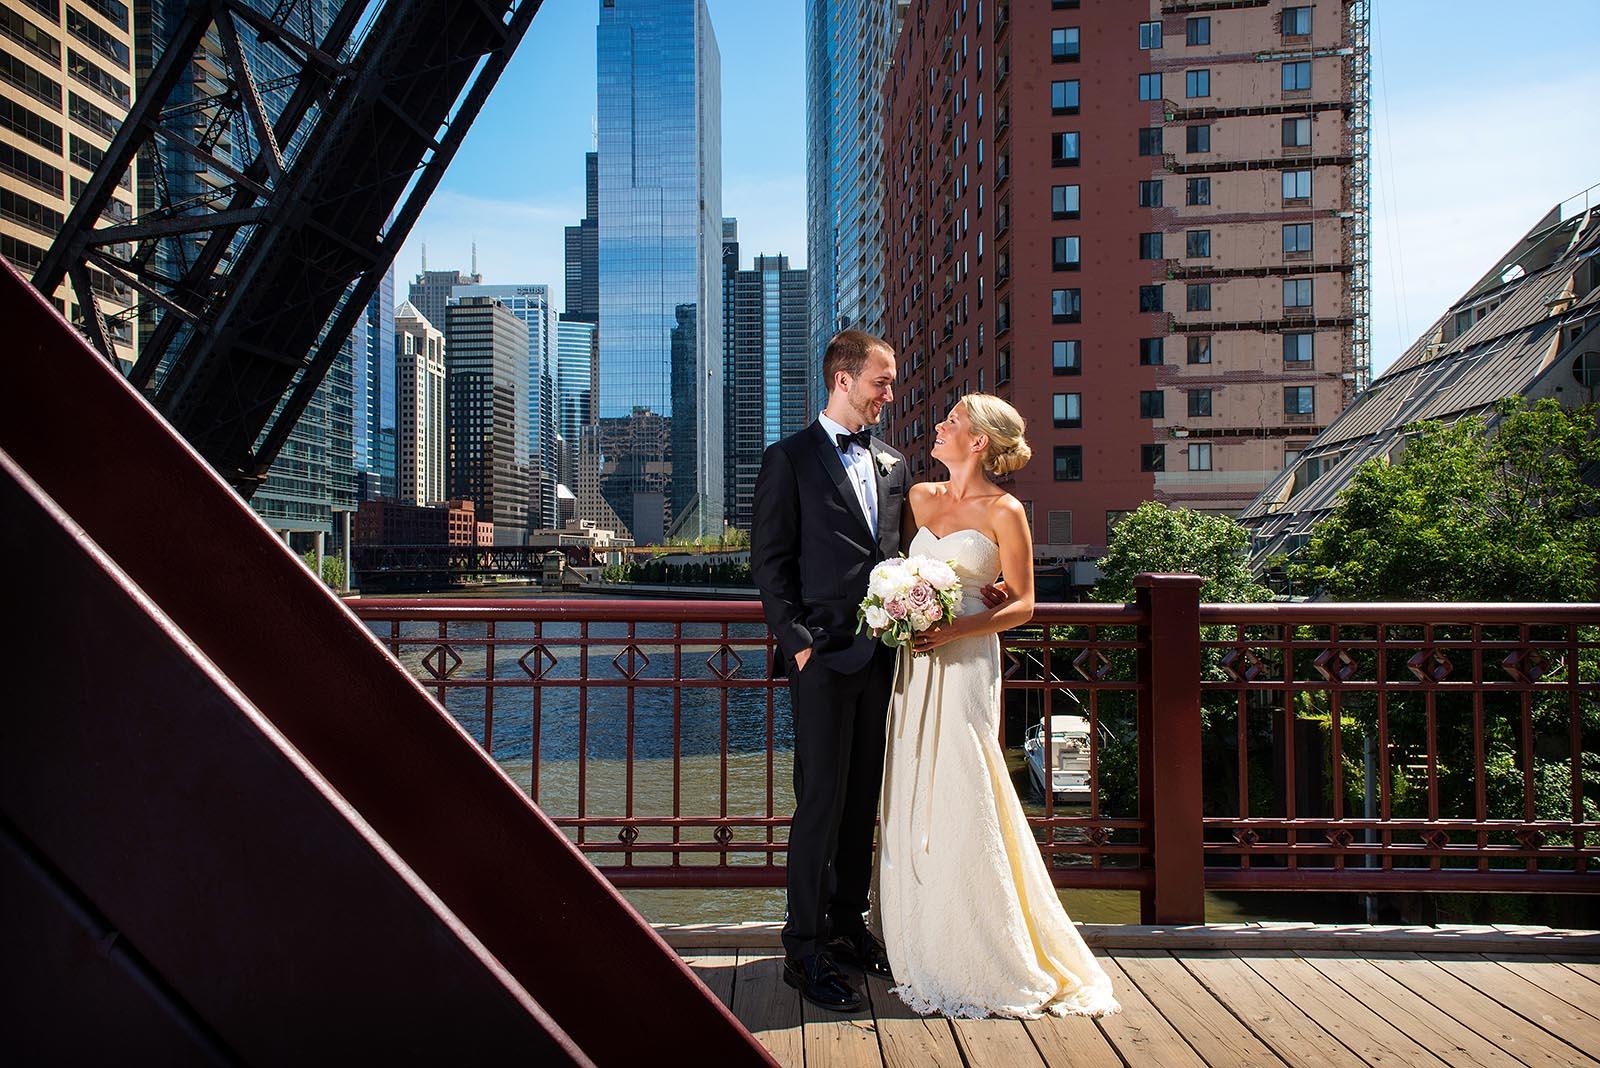 Kinzie St Bridge Wedding Photo